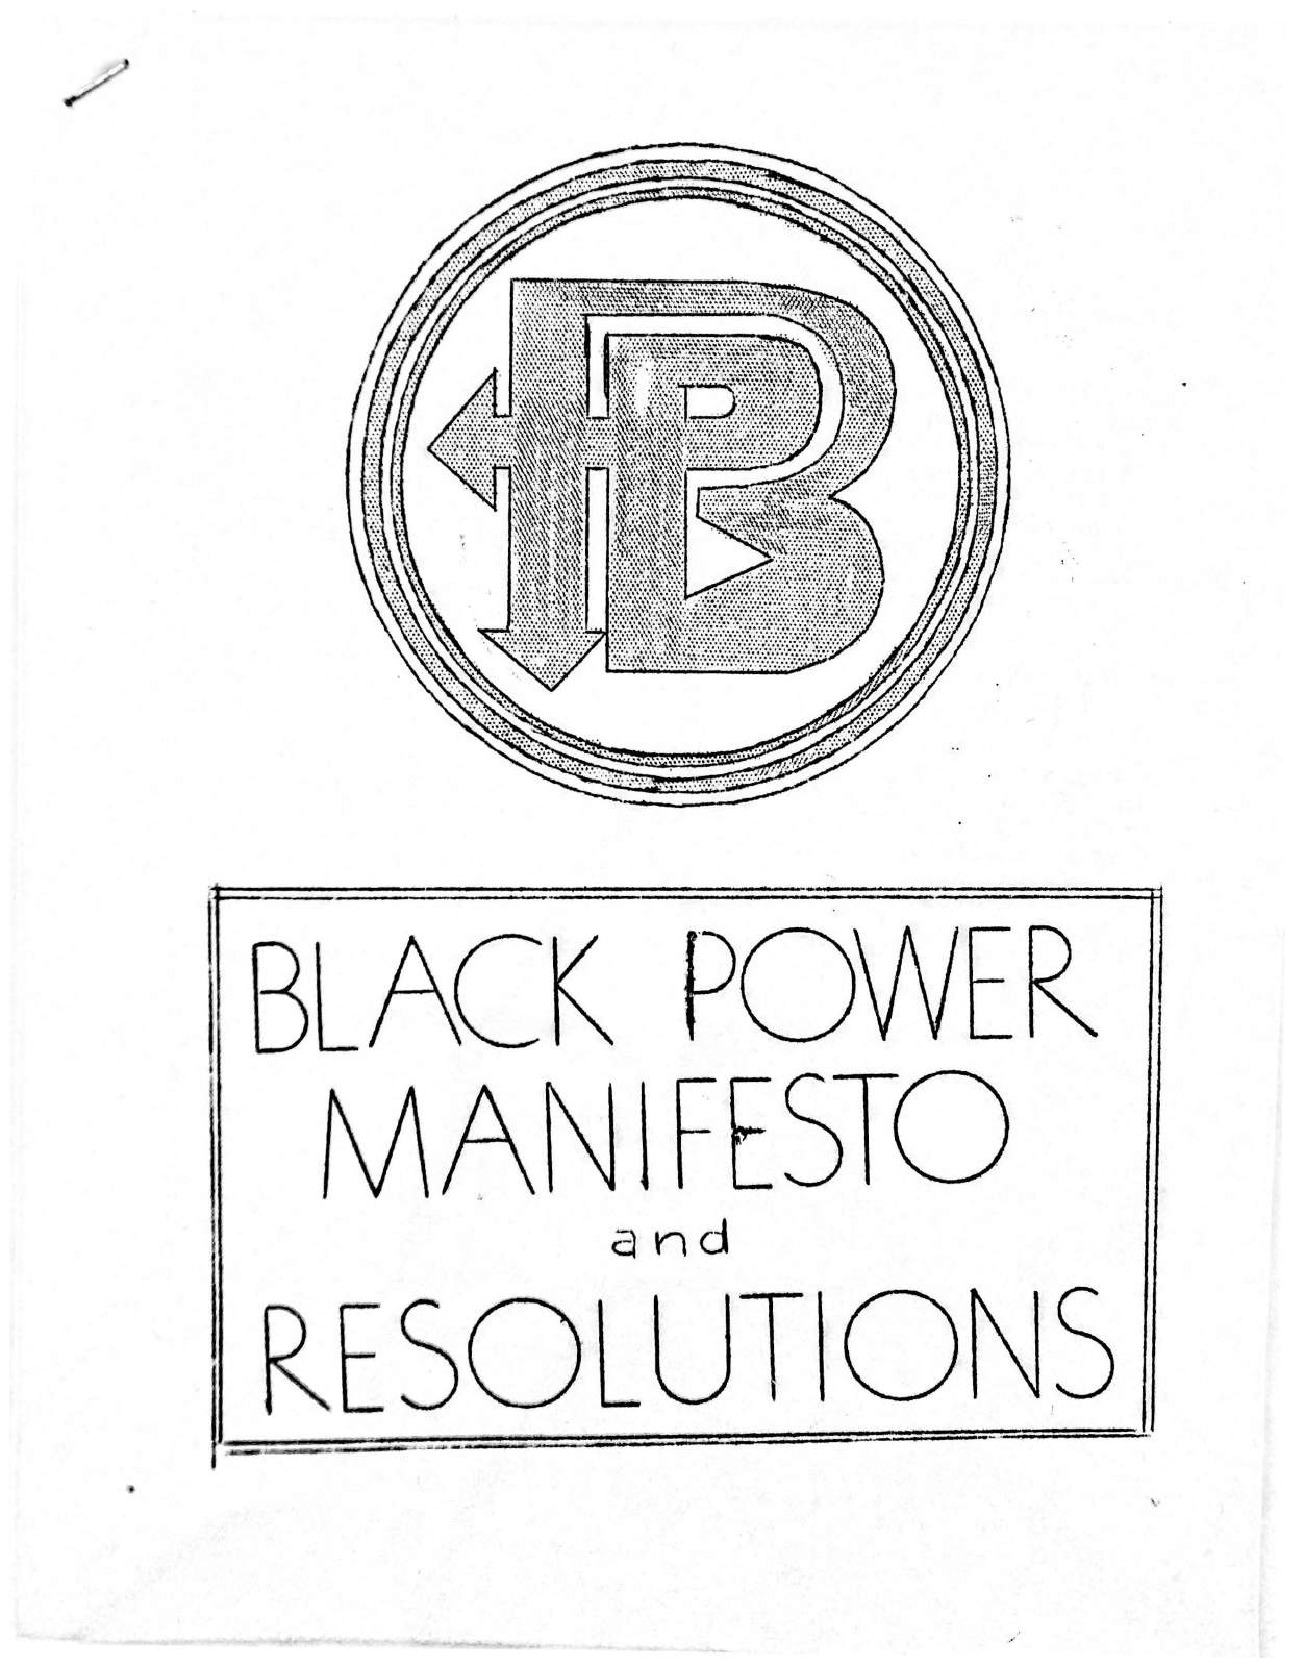 Black Power Manifesto and Resolutions